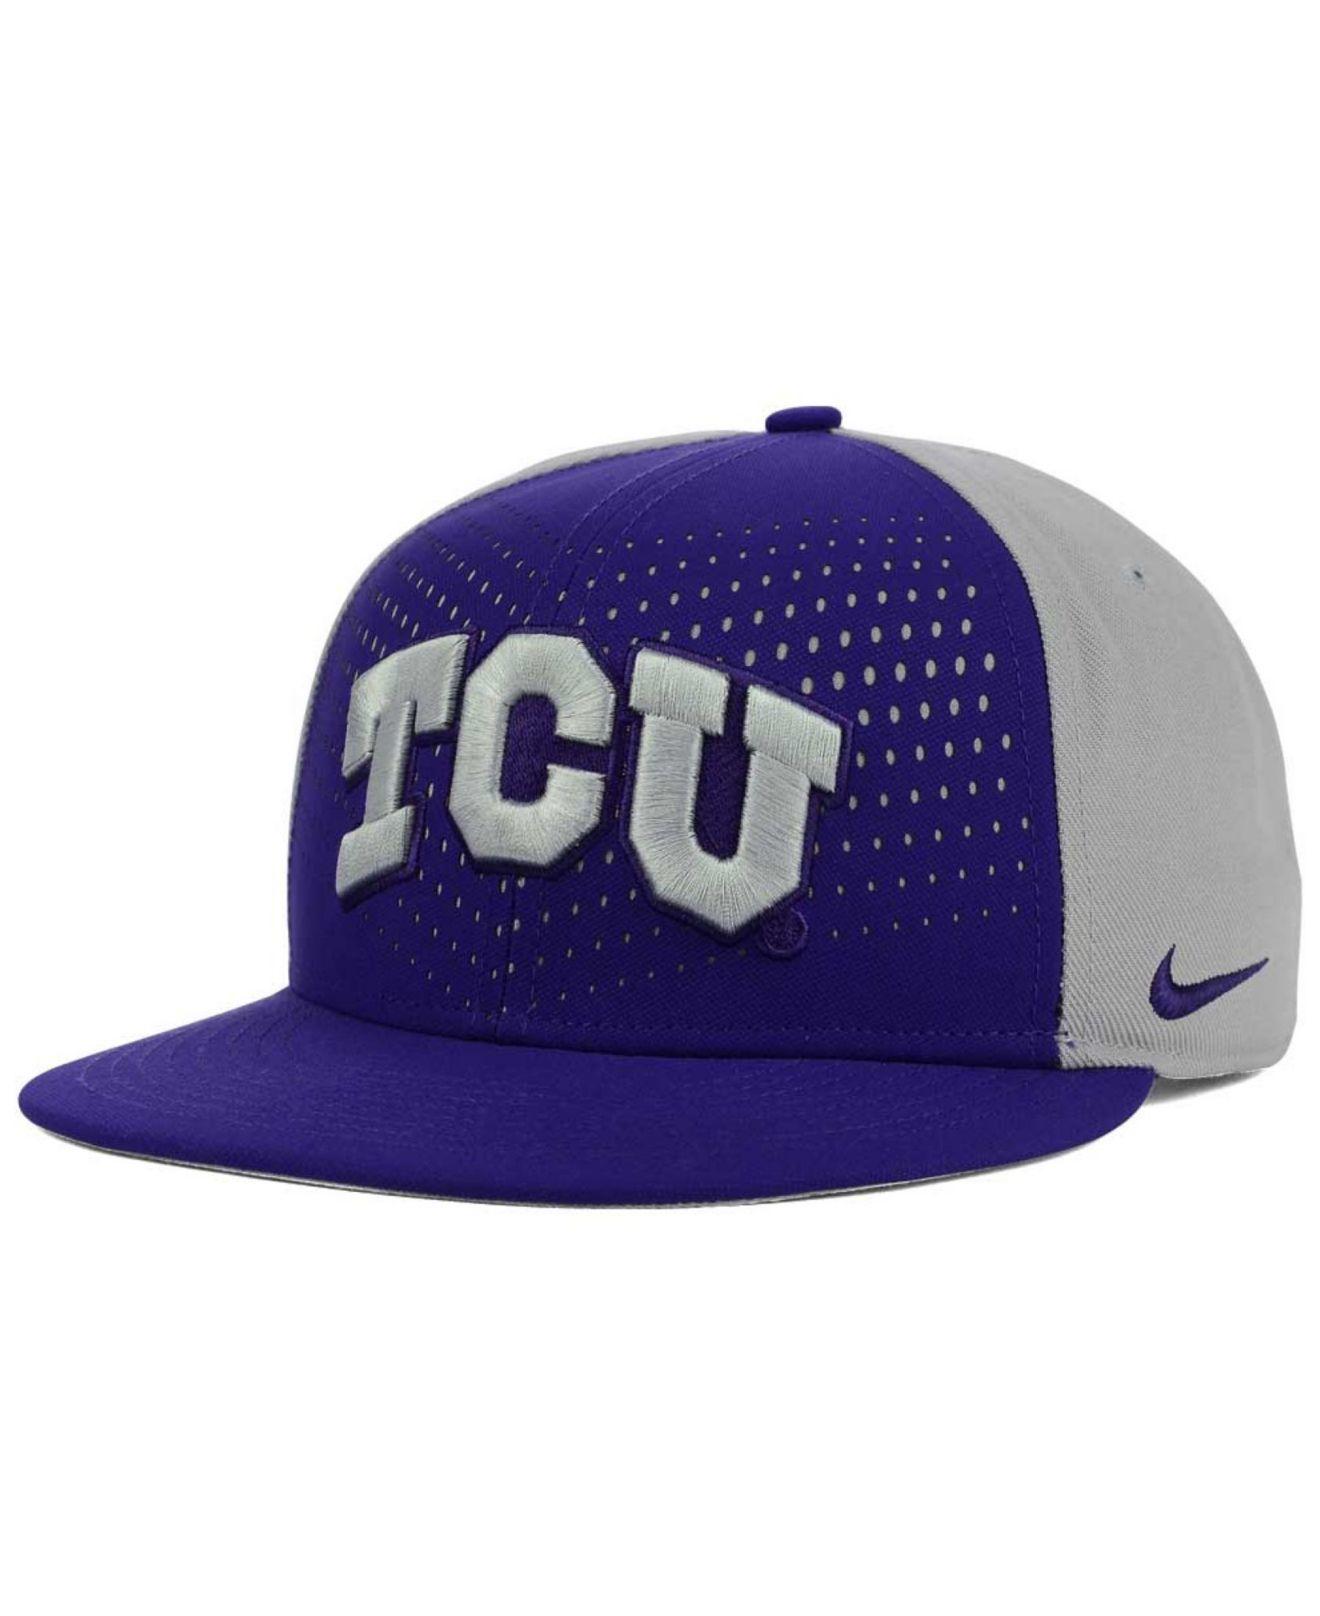 online retailer 42fdb 4cc4a ... adjustable hat gray purple ae53d 3bb26  best price lyst nike tcu horned  frogs true seasonal snapback cap in purple 9bde5 08528